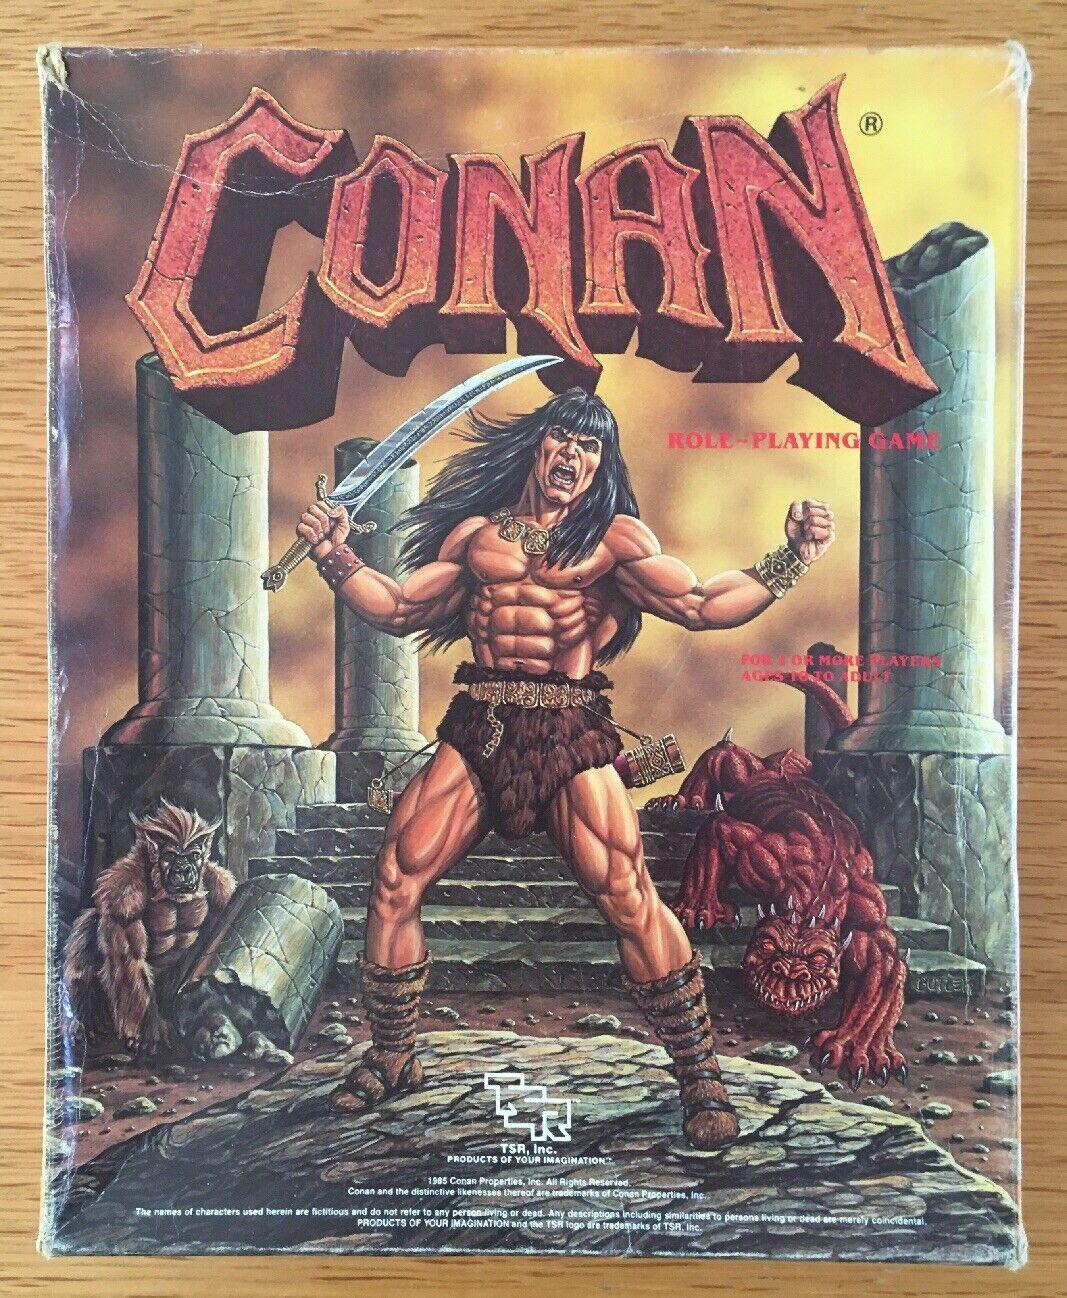 Conan Role Jugaring Juego Tsr 7014 Box Set Completo 1985 Rara